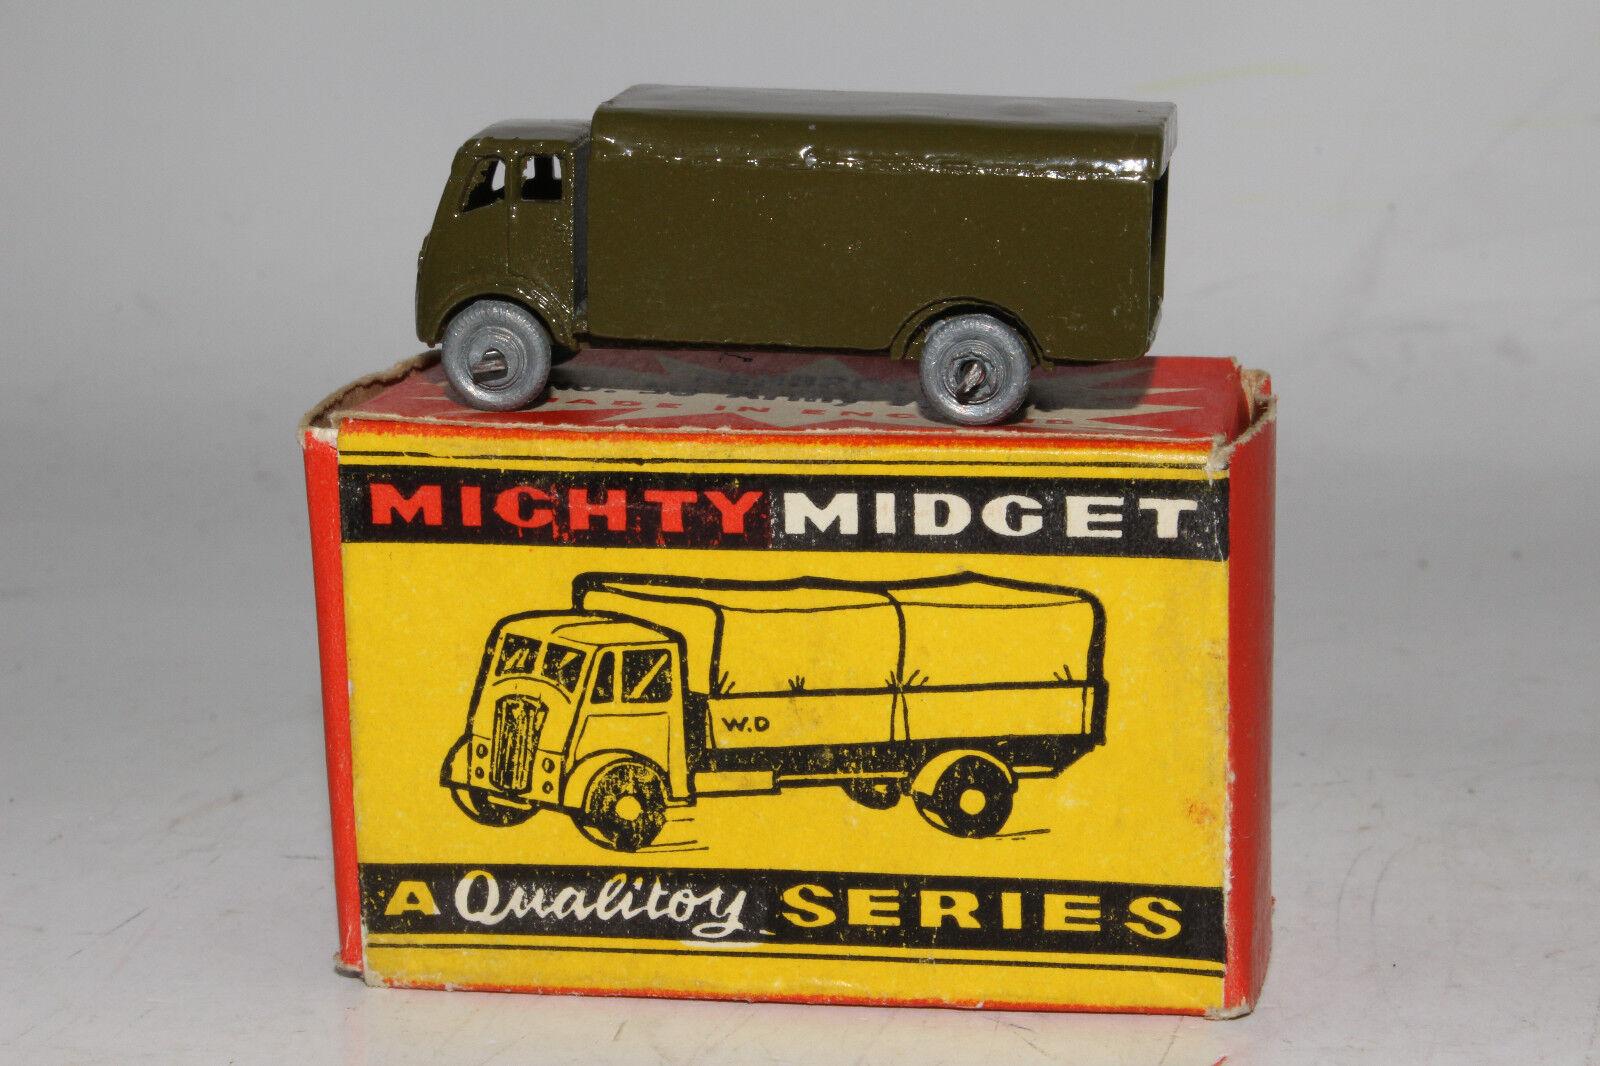 Benbros de Metal Inglaterra Carro Del Ejército Militar Camión, Excelente,